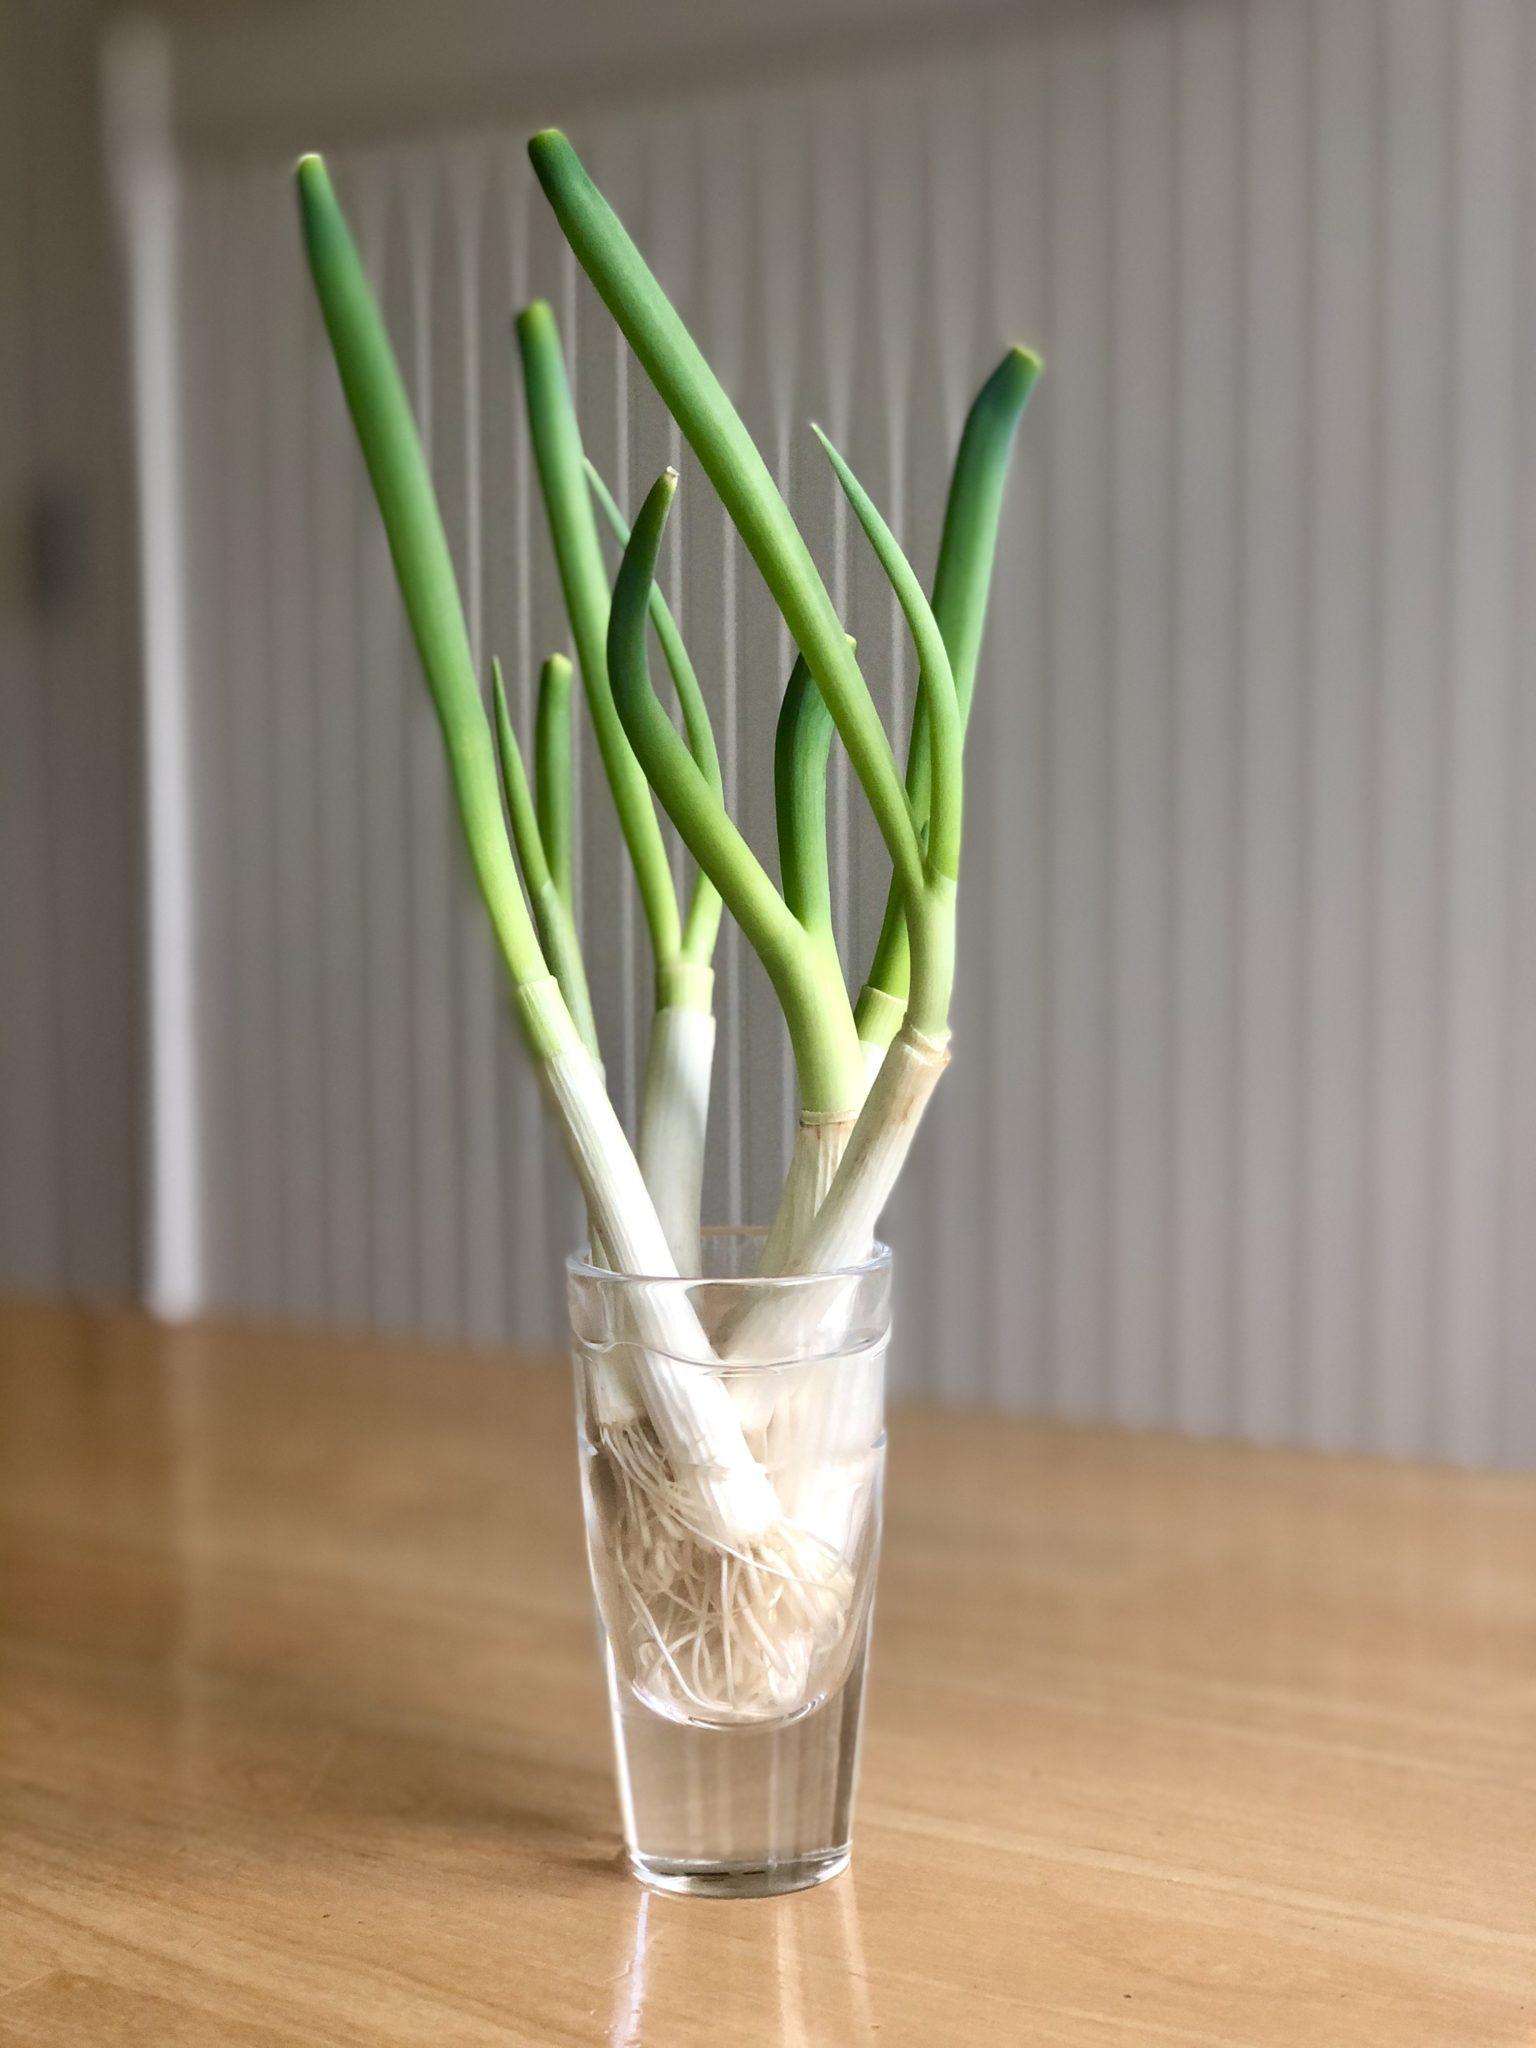 How to regrow scallions